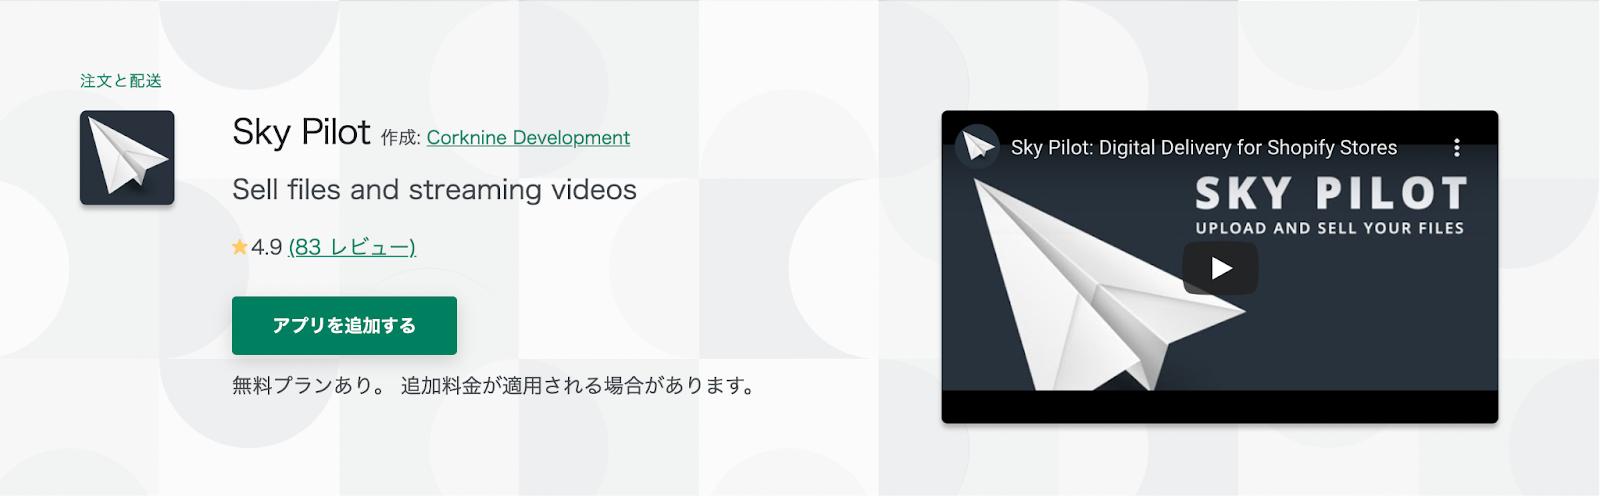 shopify デジタルコンテンツ アプリ Sky-Pilot